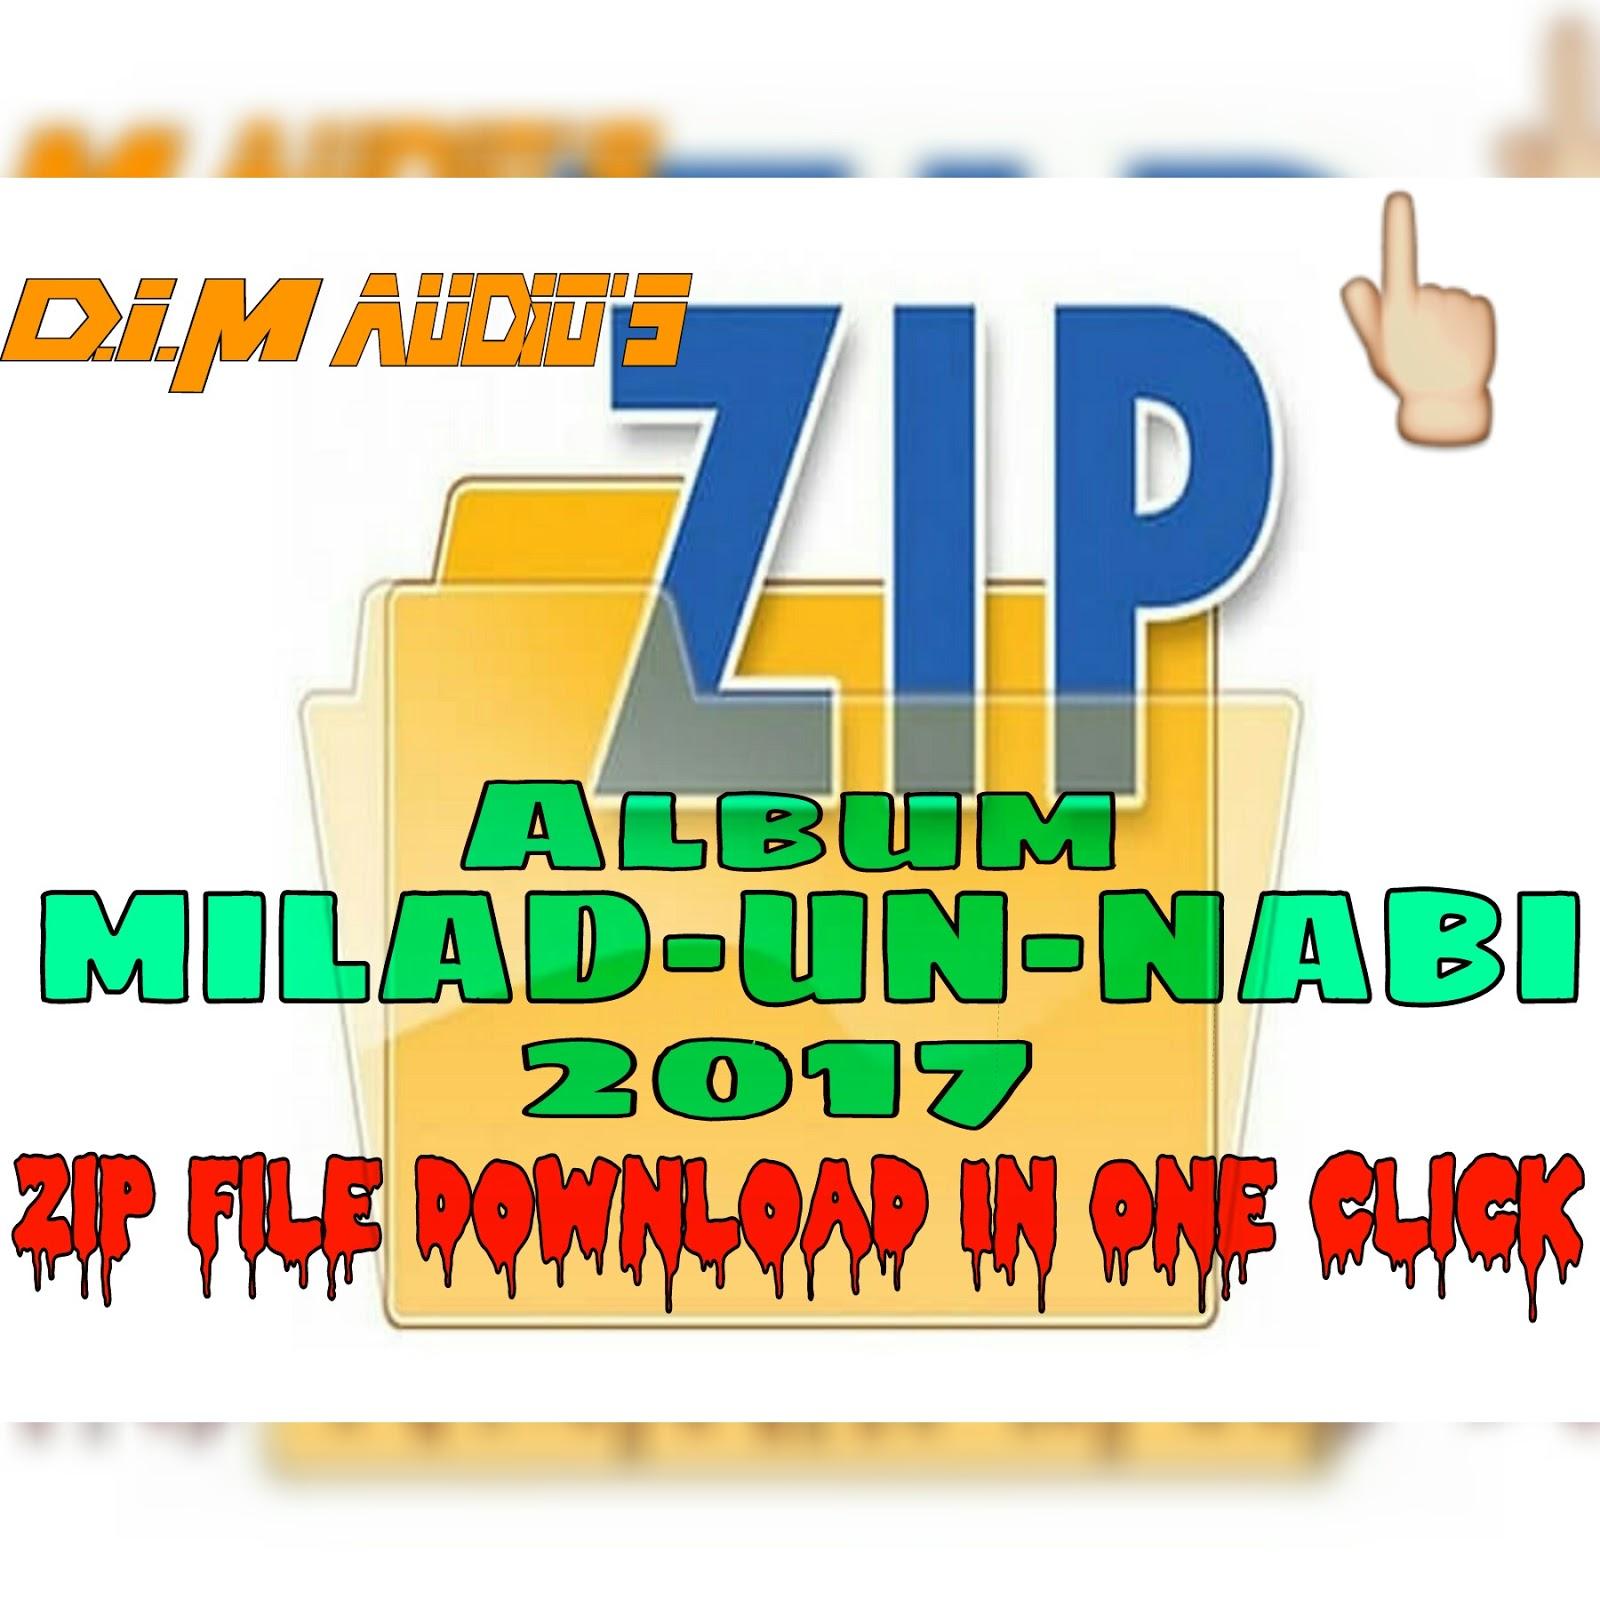 Imran Khan Song I Am Rider Mp3 Download: DJ Imran Mixing_D.I.M Audio Sagar M.P.: Download:-ZIP FILE